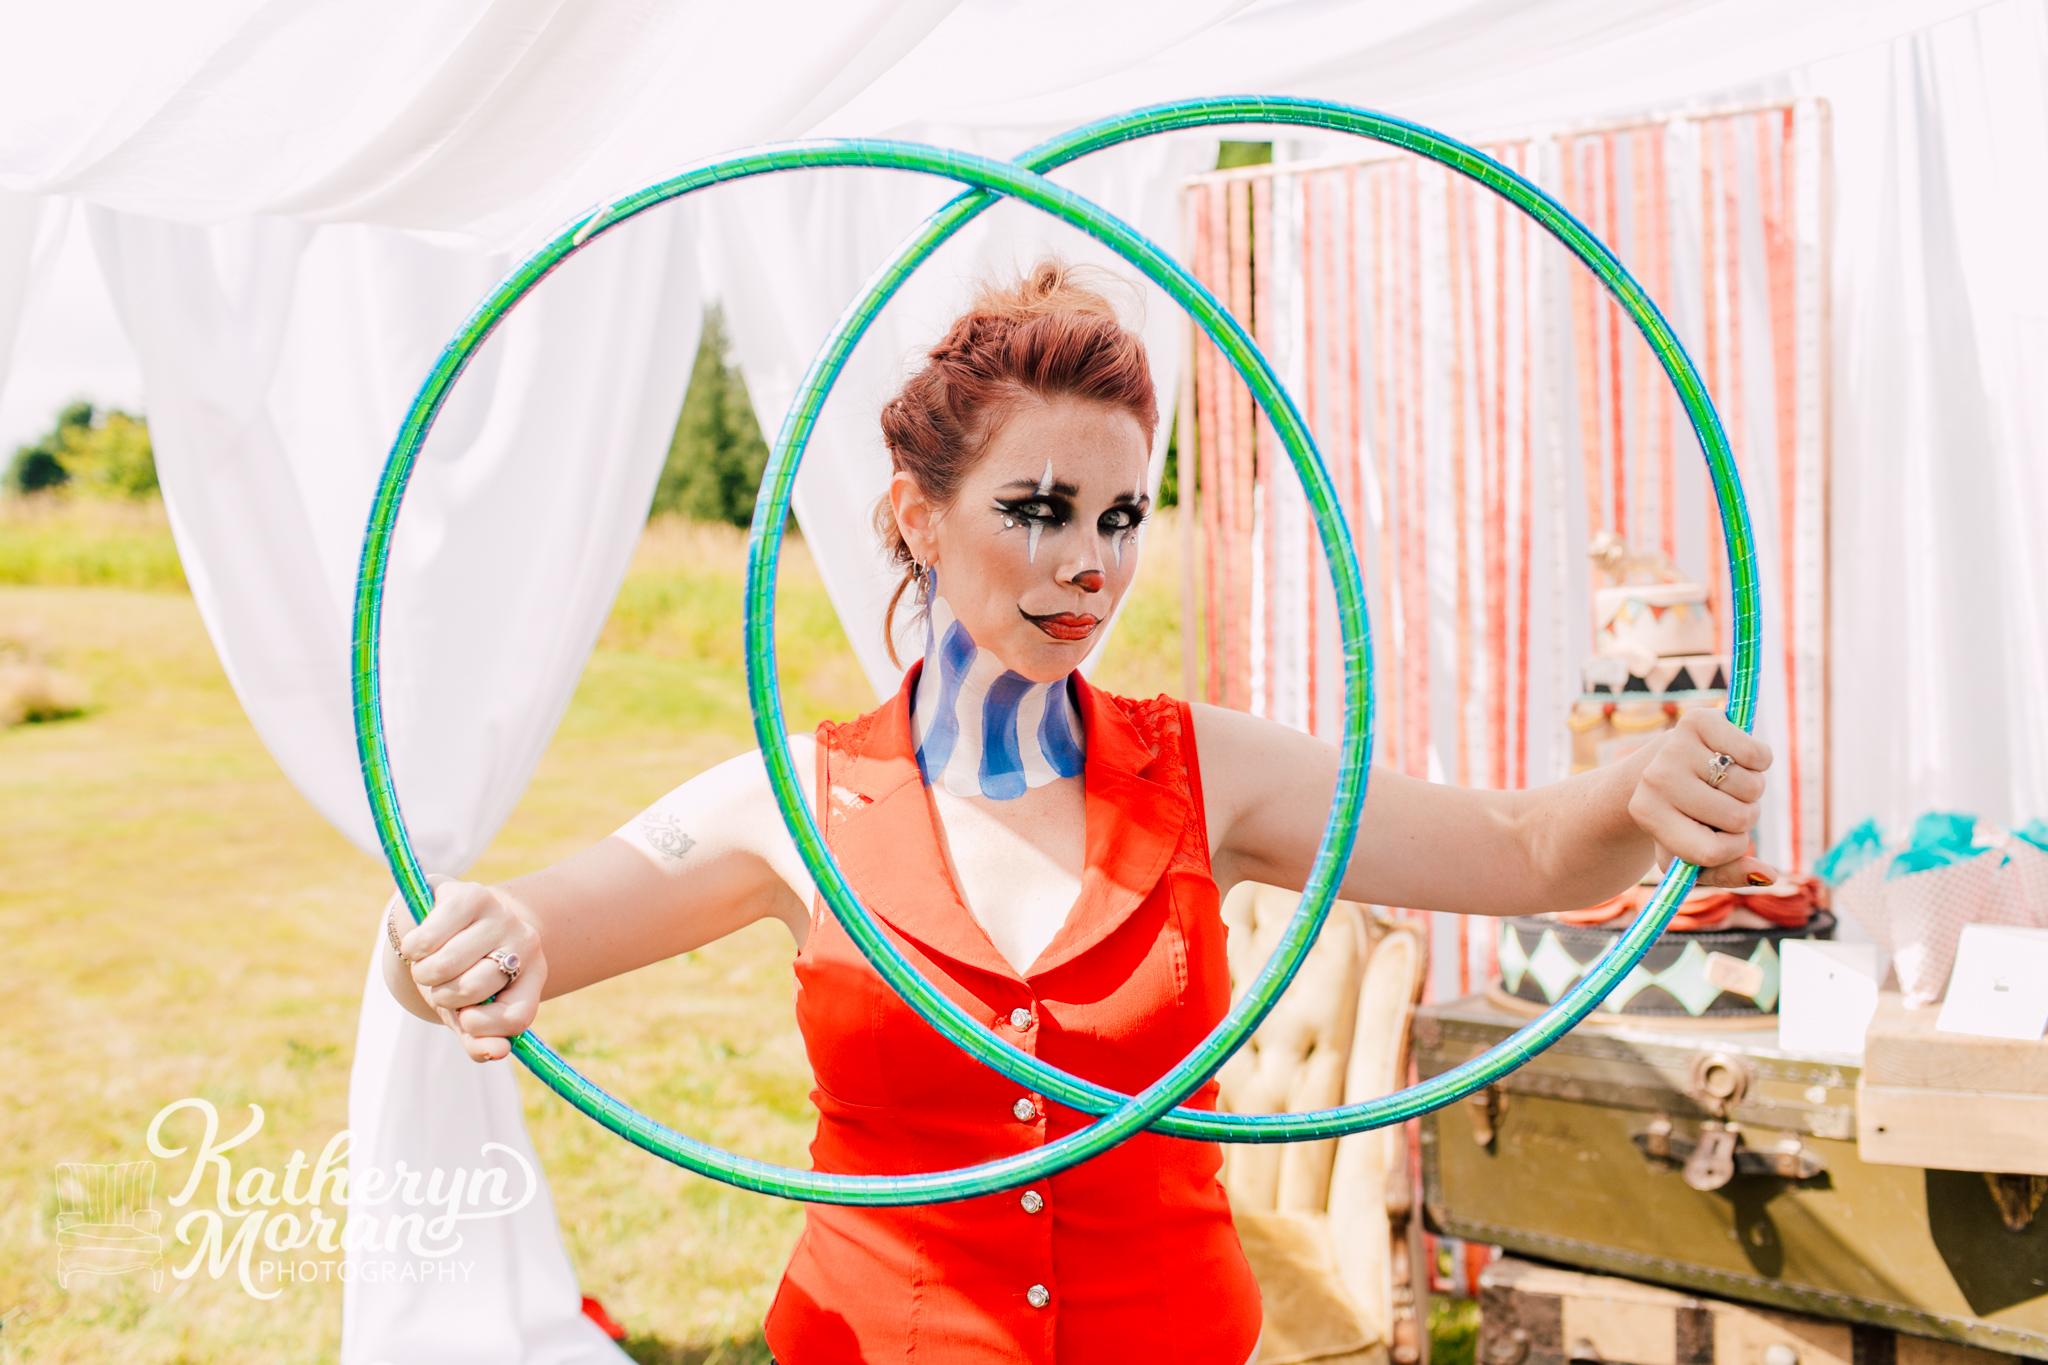 bellingham-seattle-event-photographer-vintage-circus-styled-katheryn-moran-188.jpg